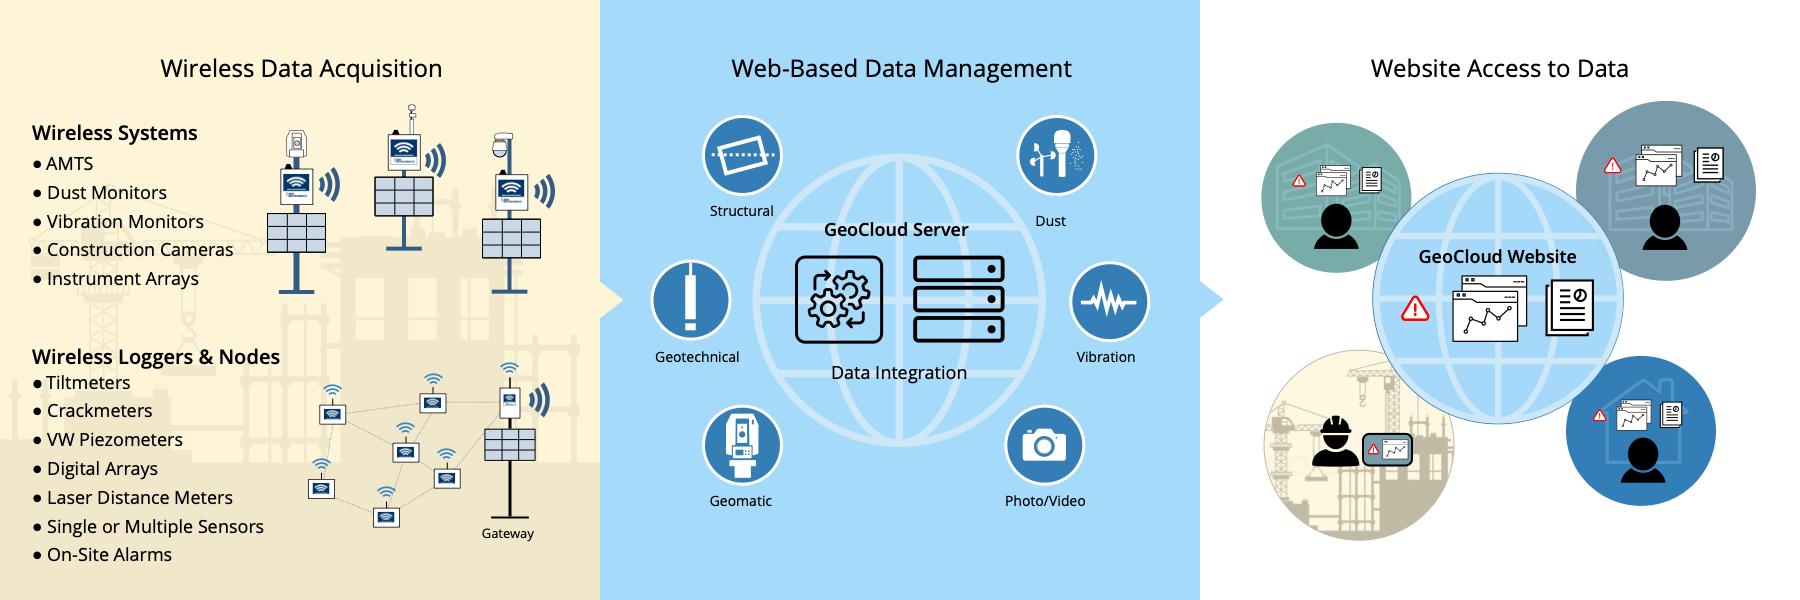 Wireless Data Logging - Graphic